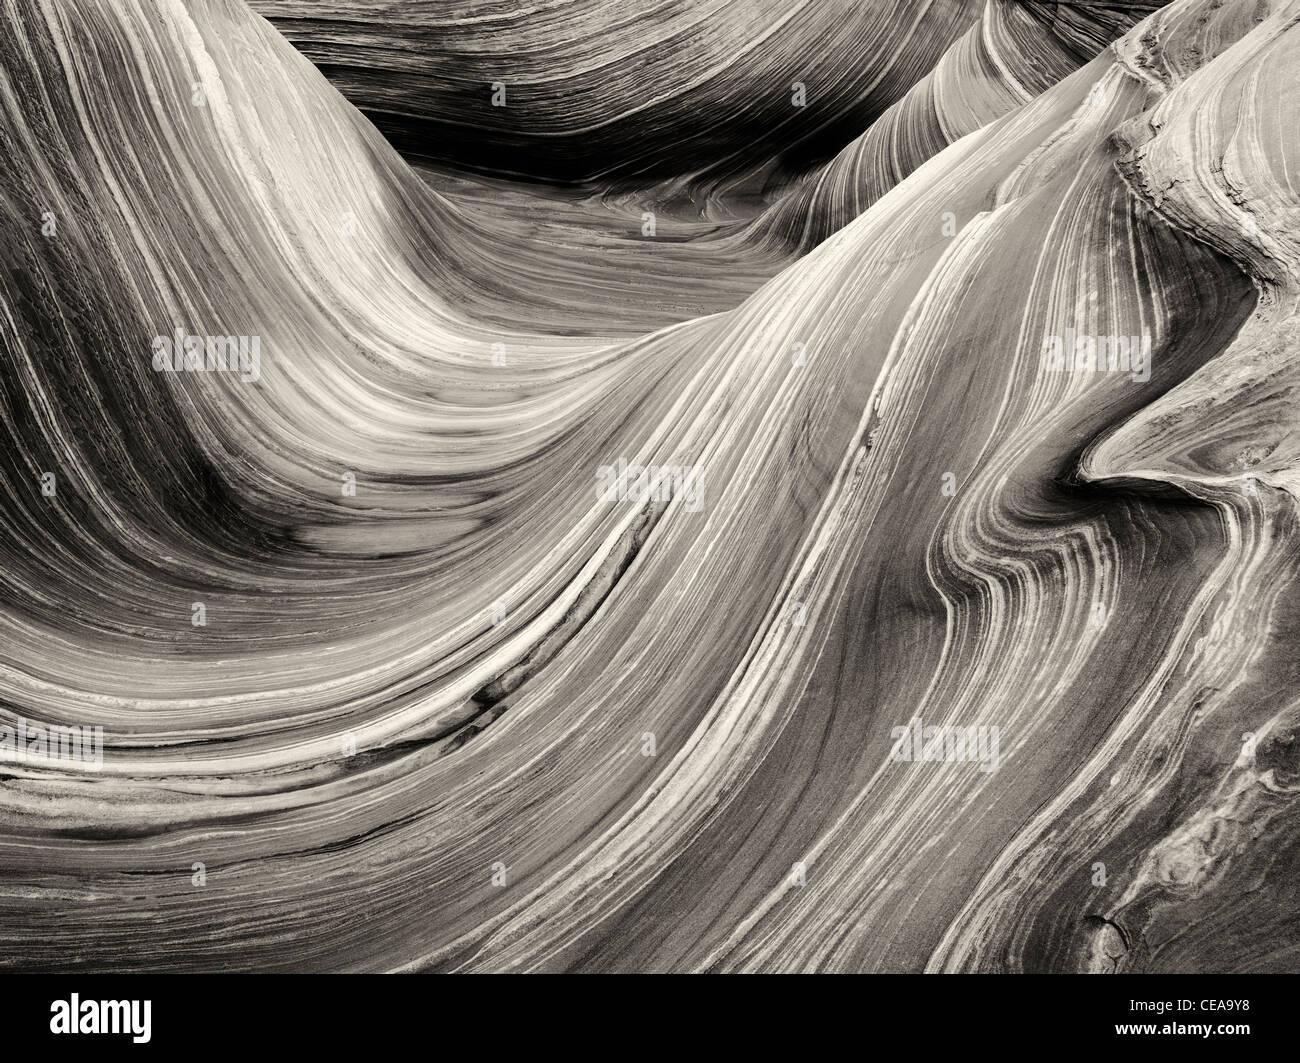 Sandtone Coyote Buttes North dans la formation, l'onde. Paria Canyon Vermillion Cliffs Wilderness. Utah/Arizona Photo Stock